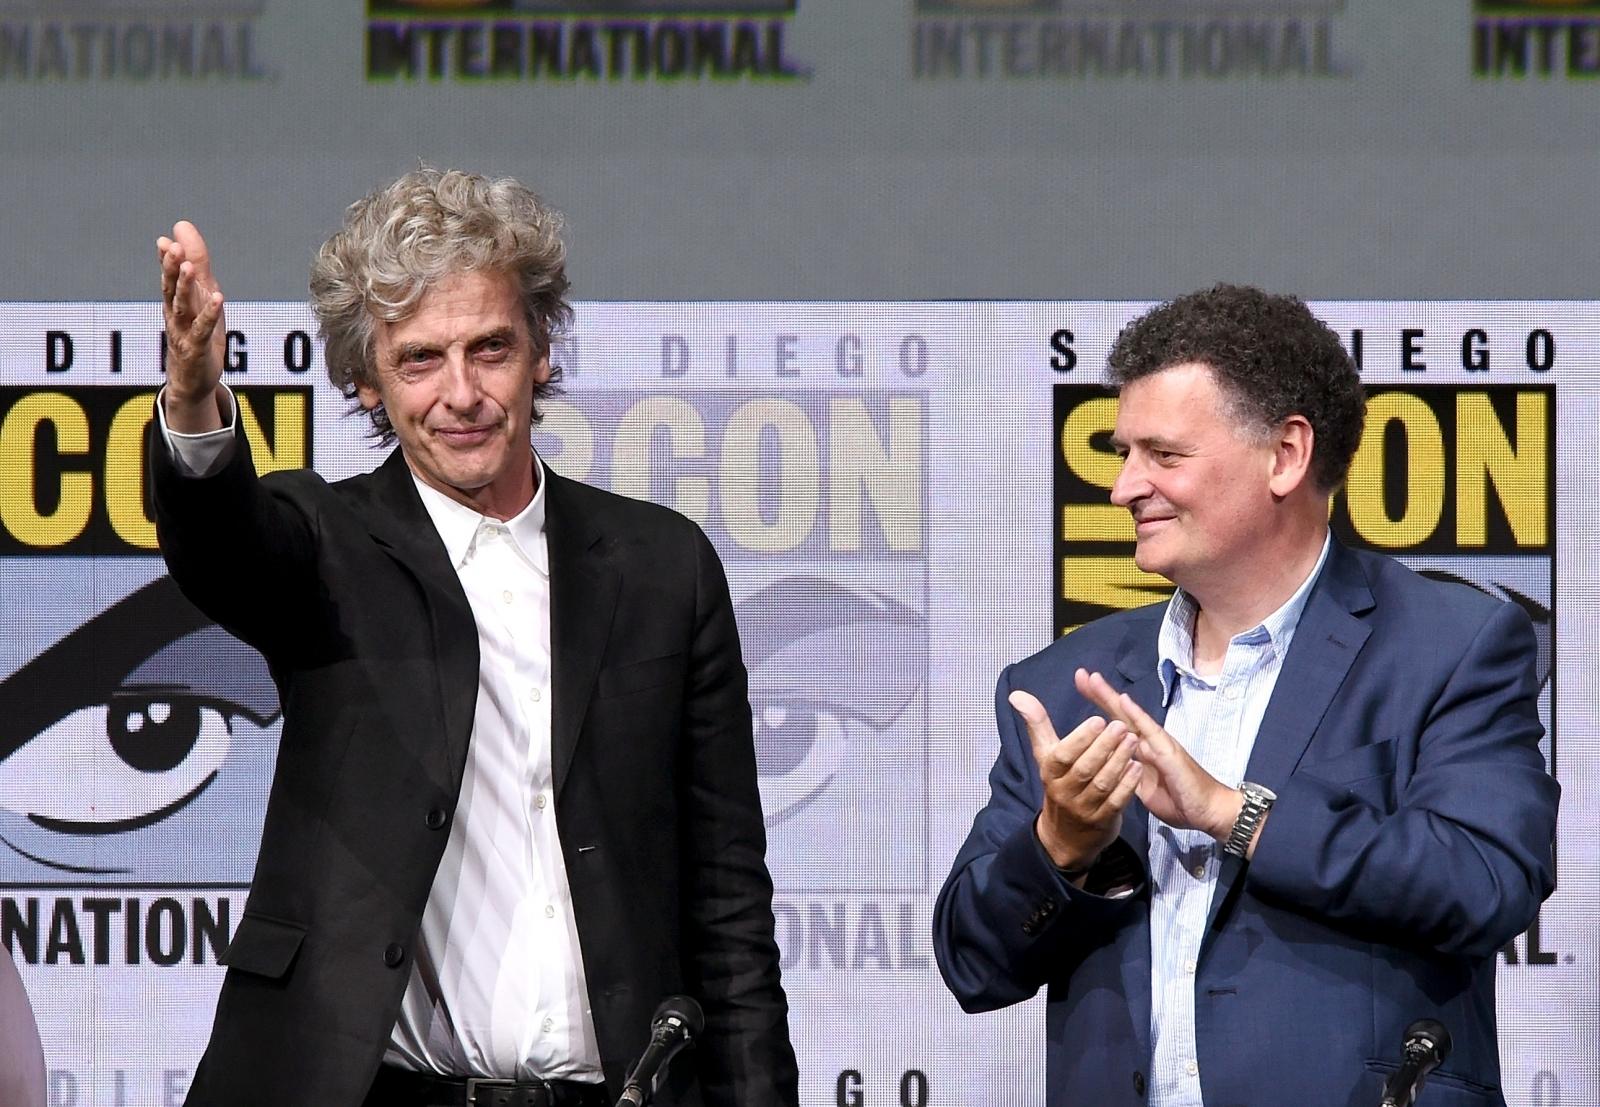 Peter Capaldi, Steven Moffat